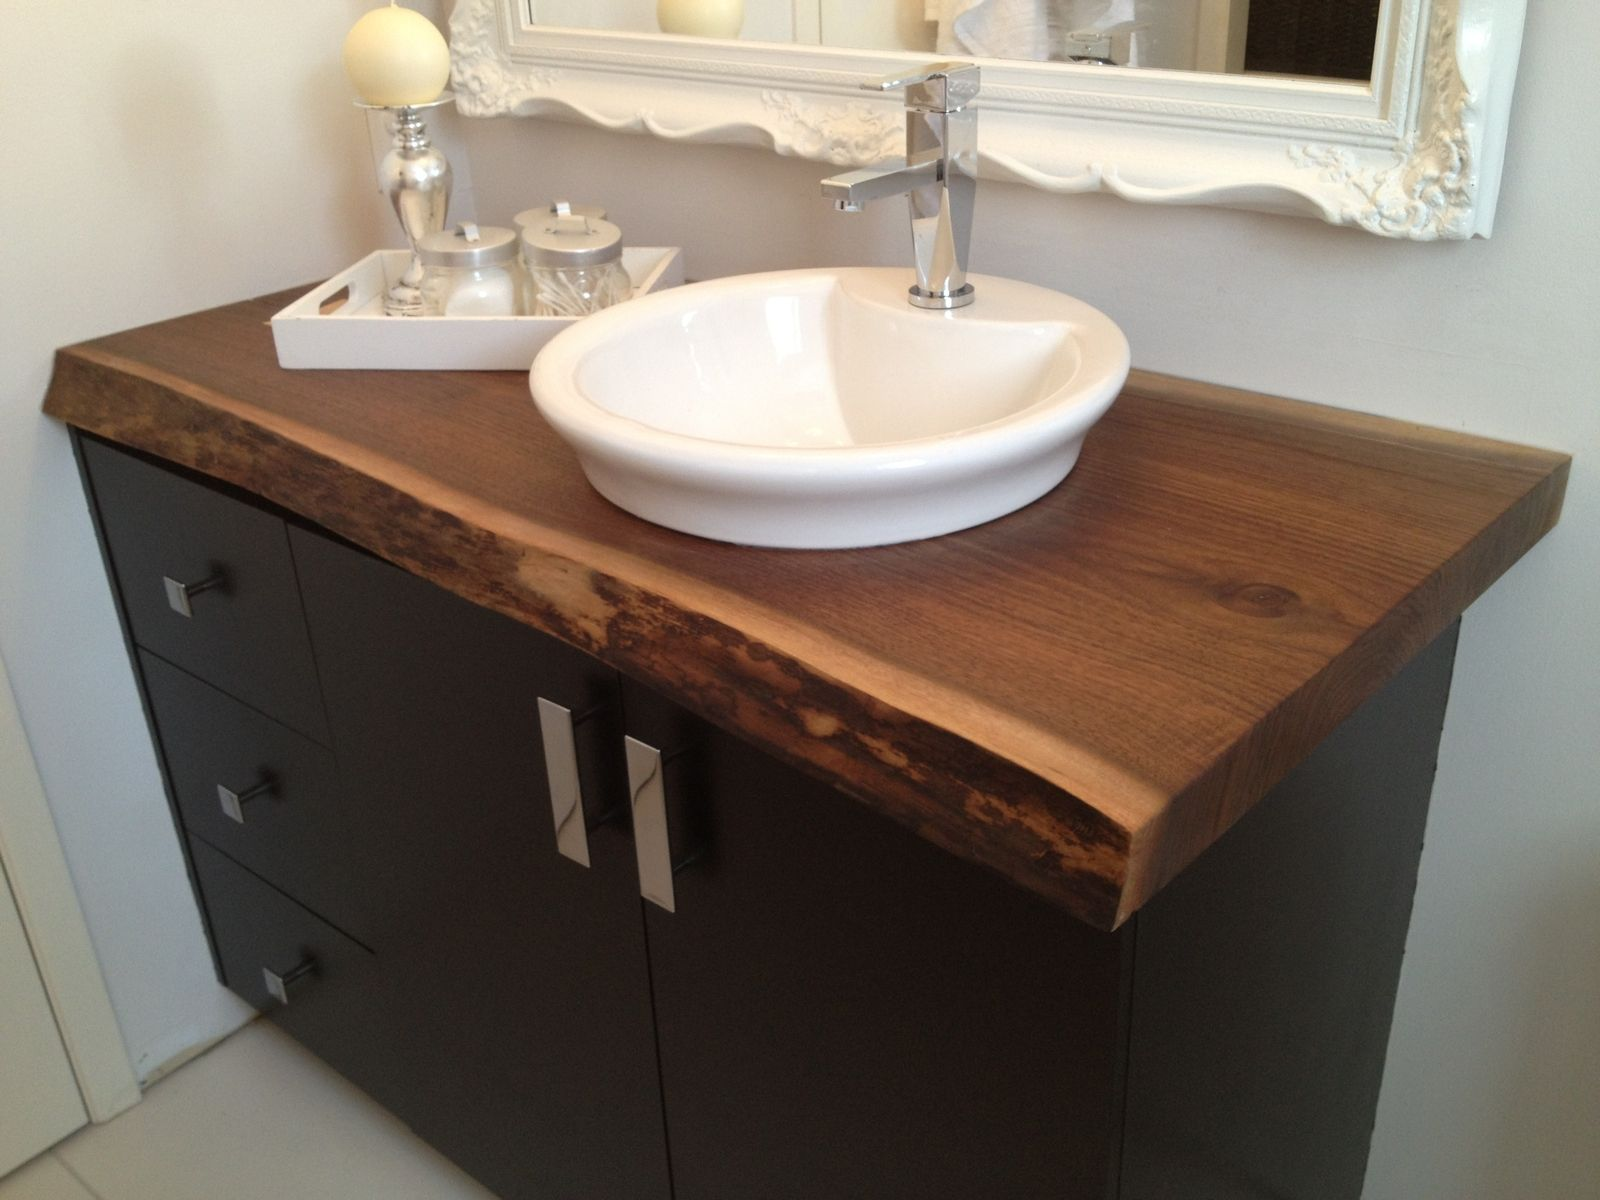 Tops Kitchen And Bath